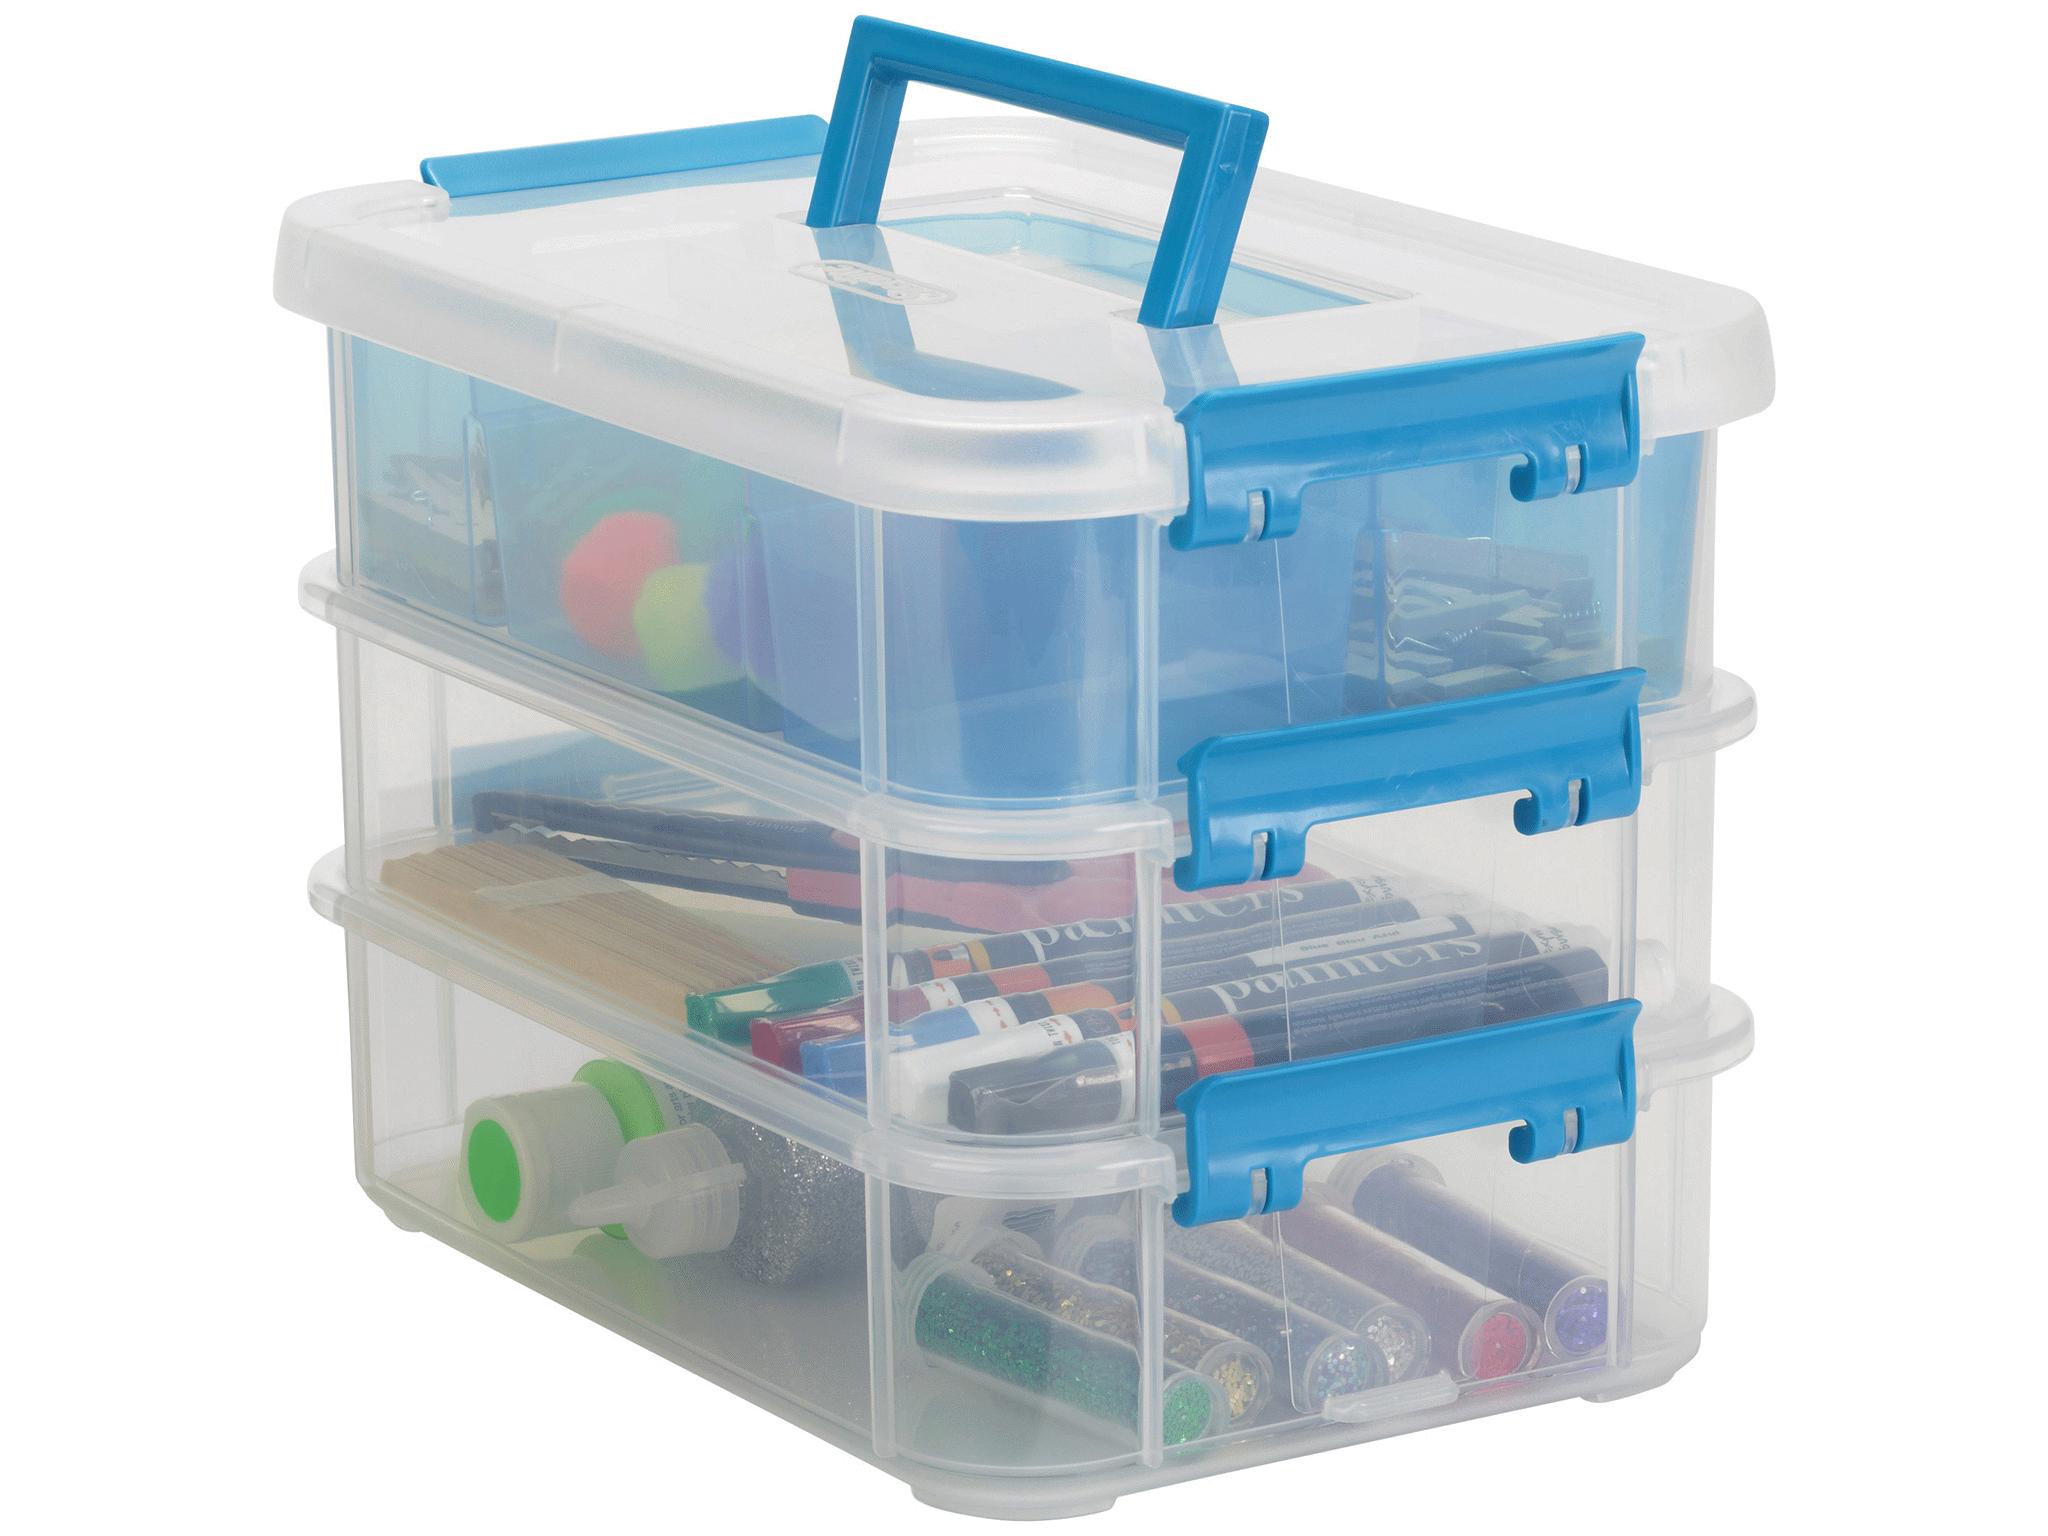 Storage Totes | Meijer.com